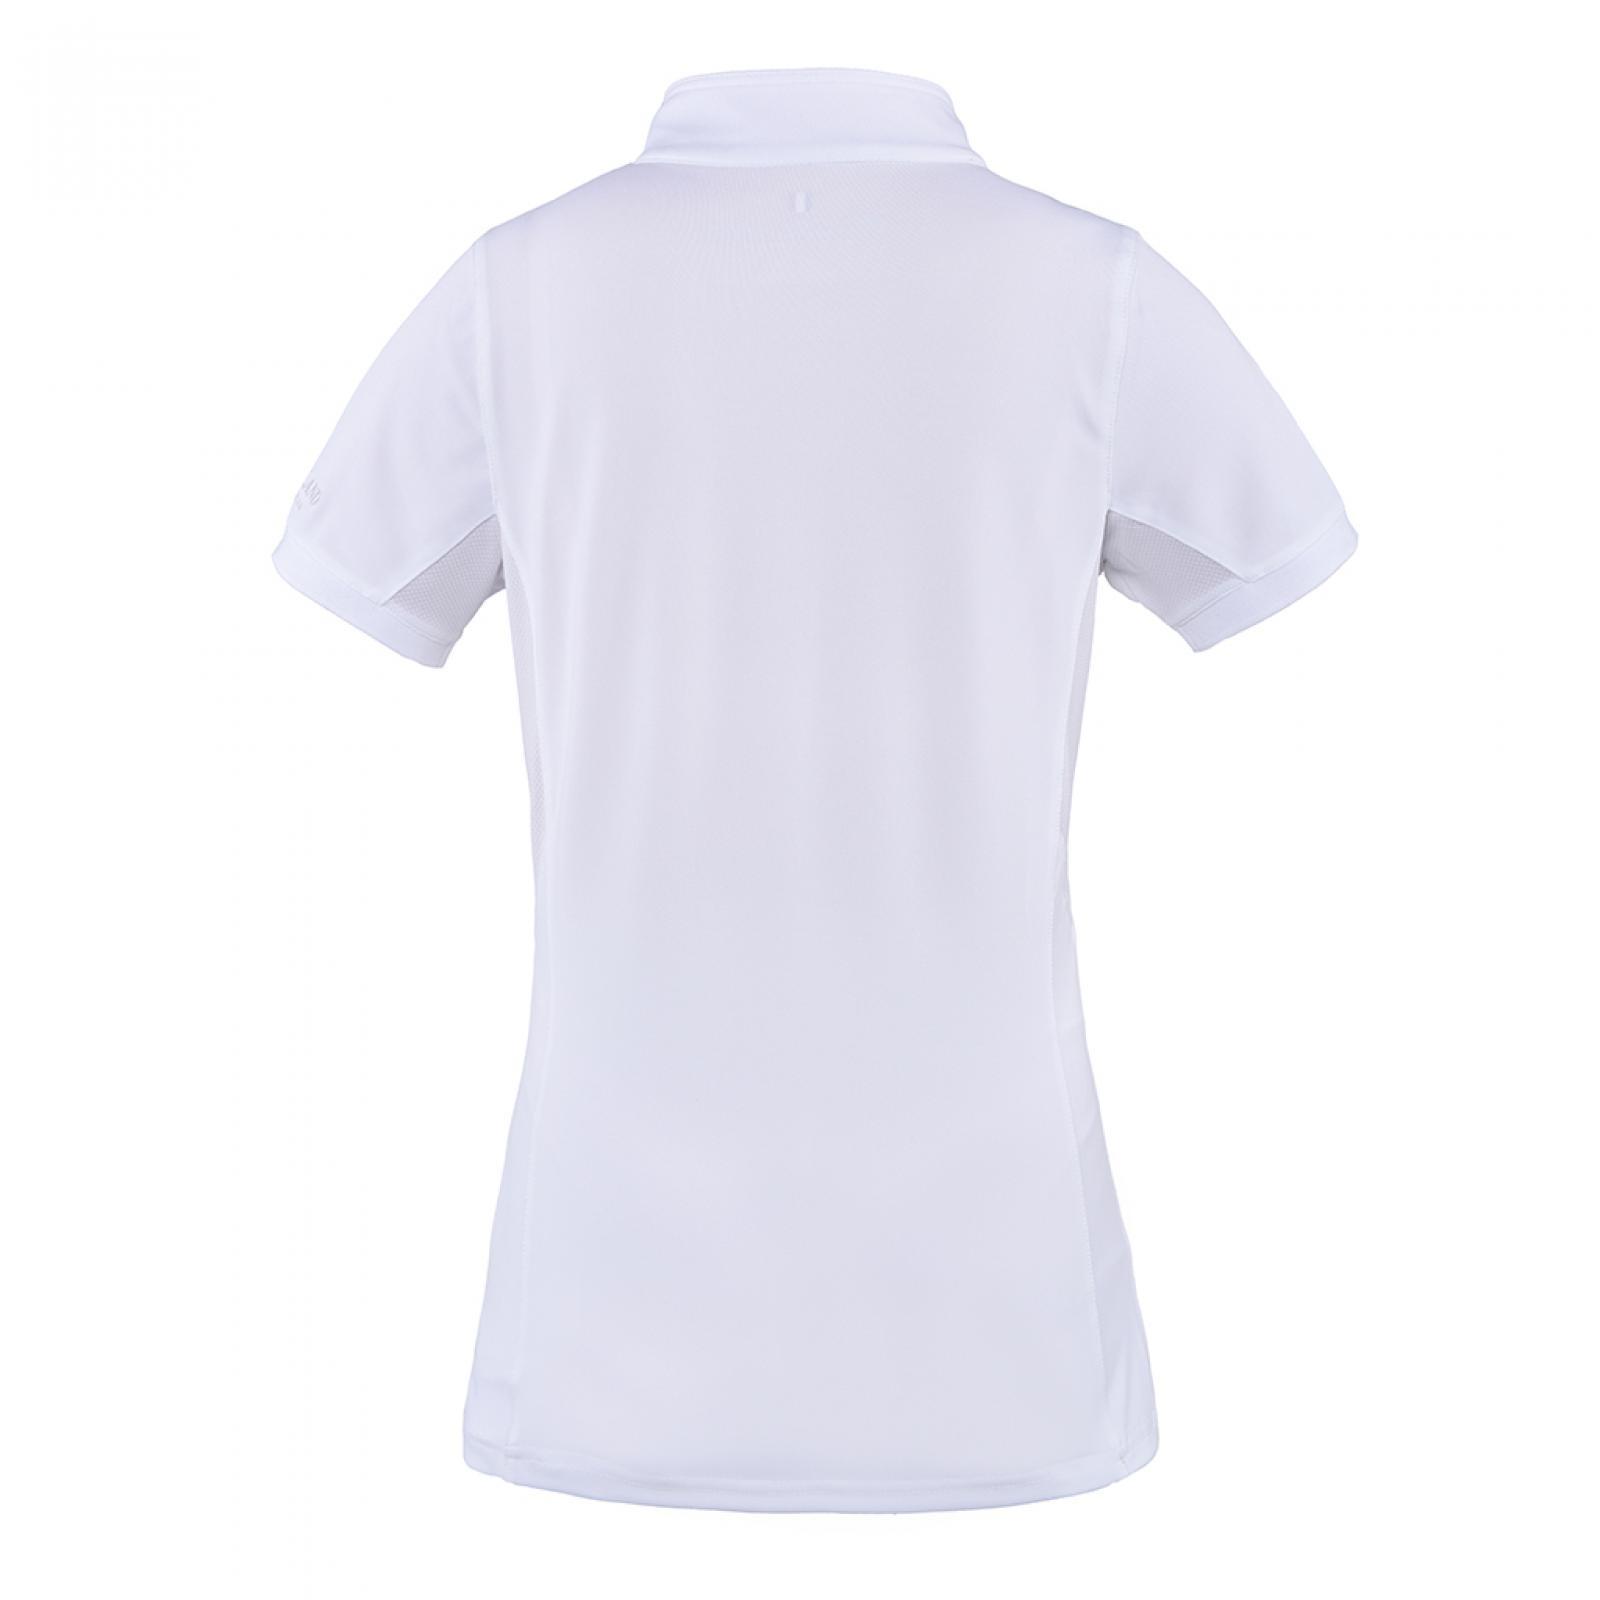 Kingsland Kingsland - Classic ladies short sleeve show shirt white